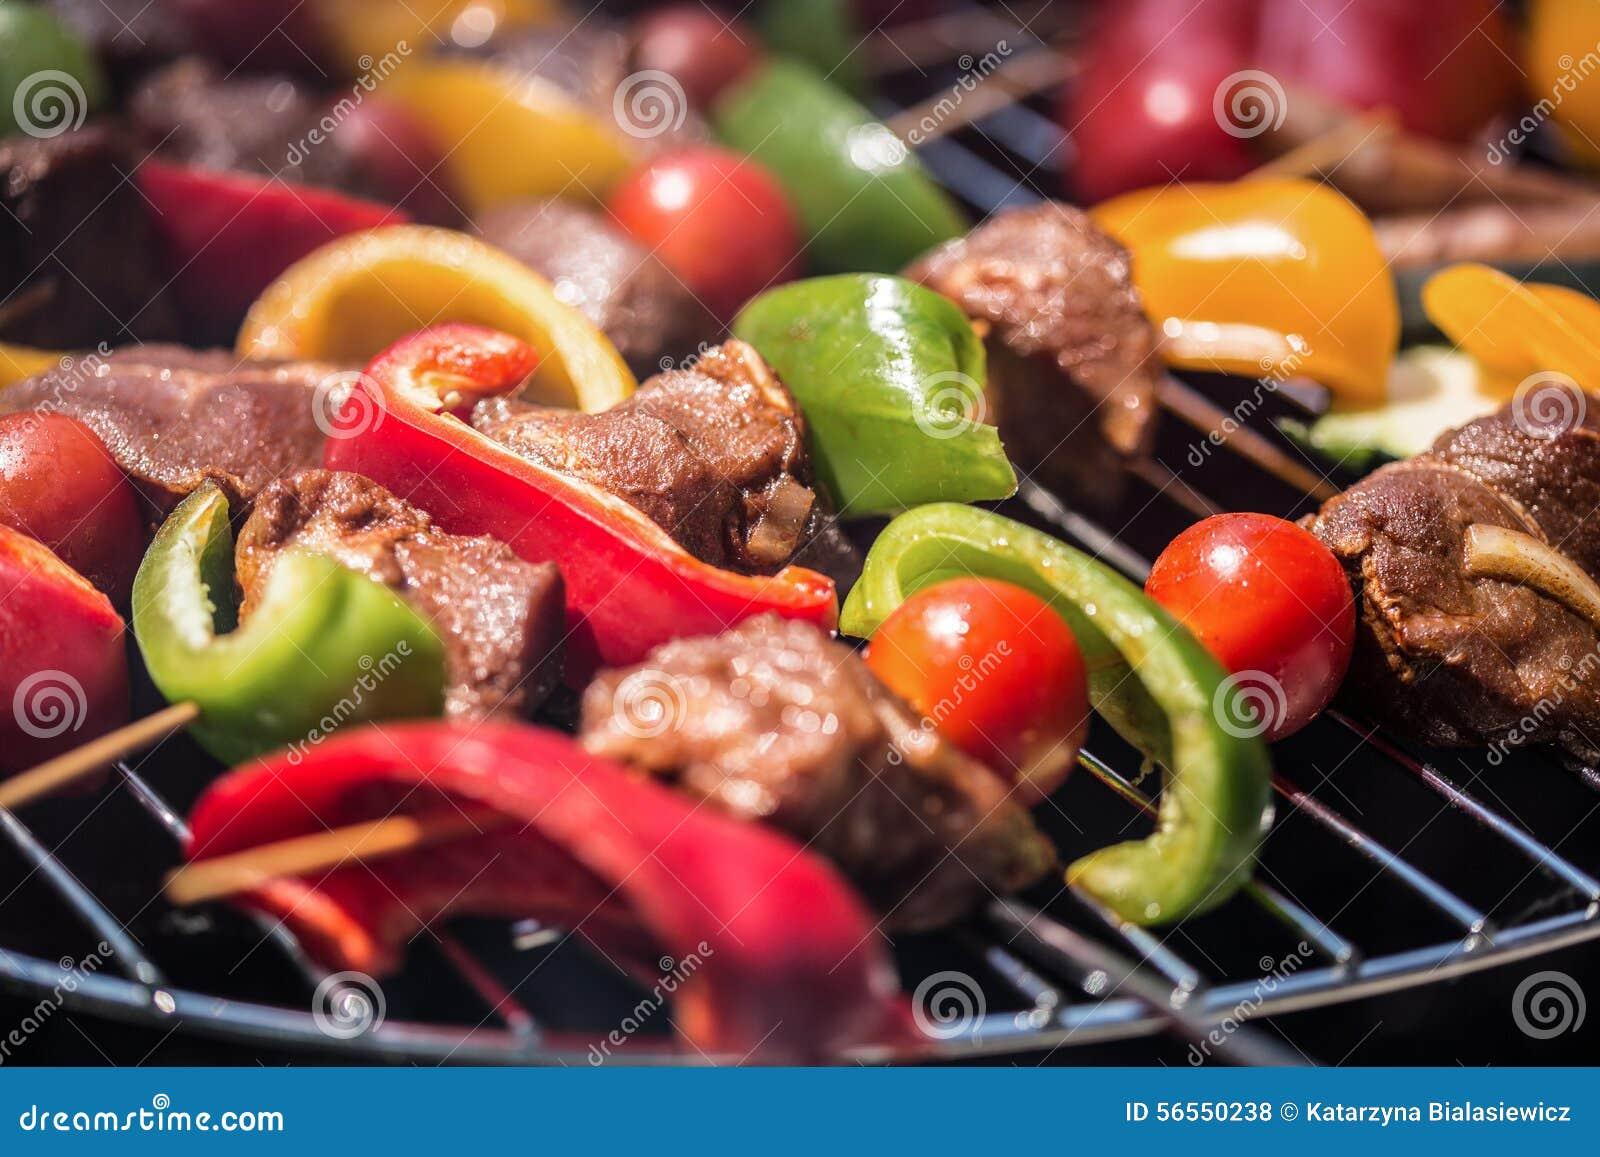 Download Εύγευστα Shashliks στη σχάρα Στοκ Εικόνες - εικόνα από μαγειρευμένος, συστατικό: 56550238